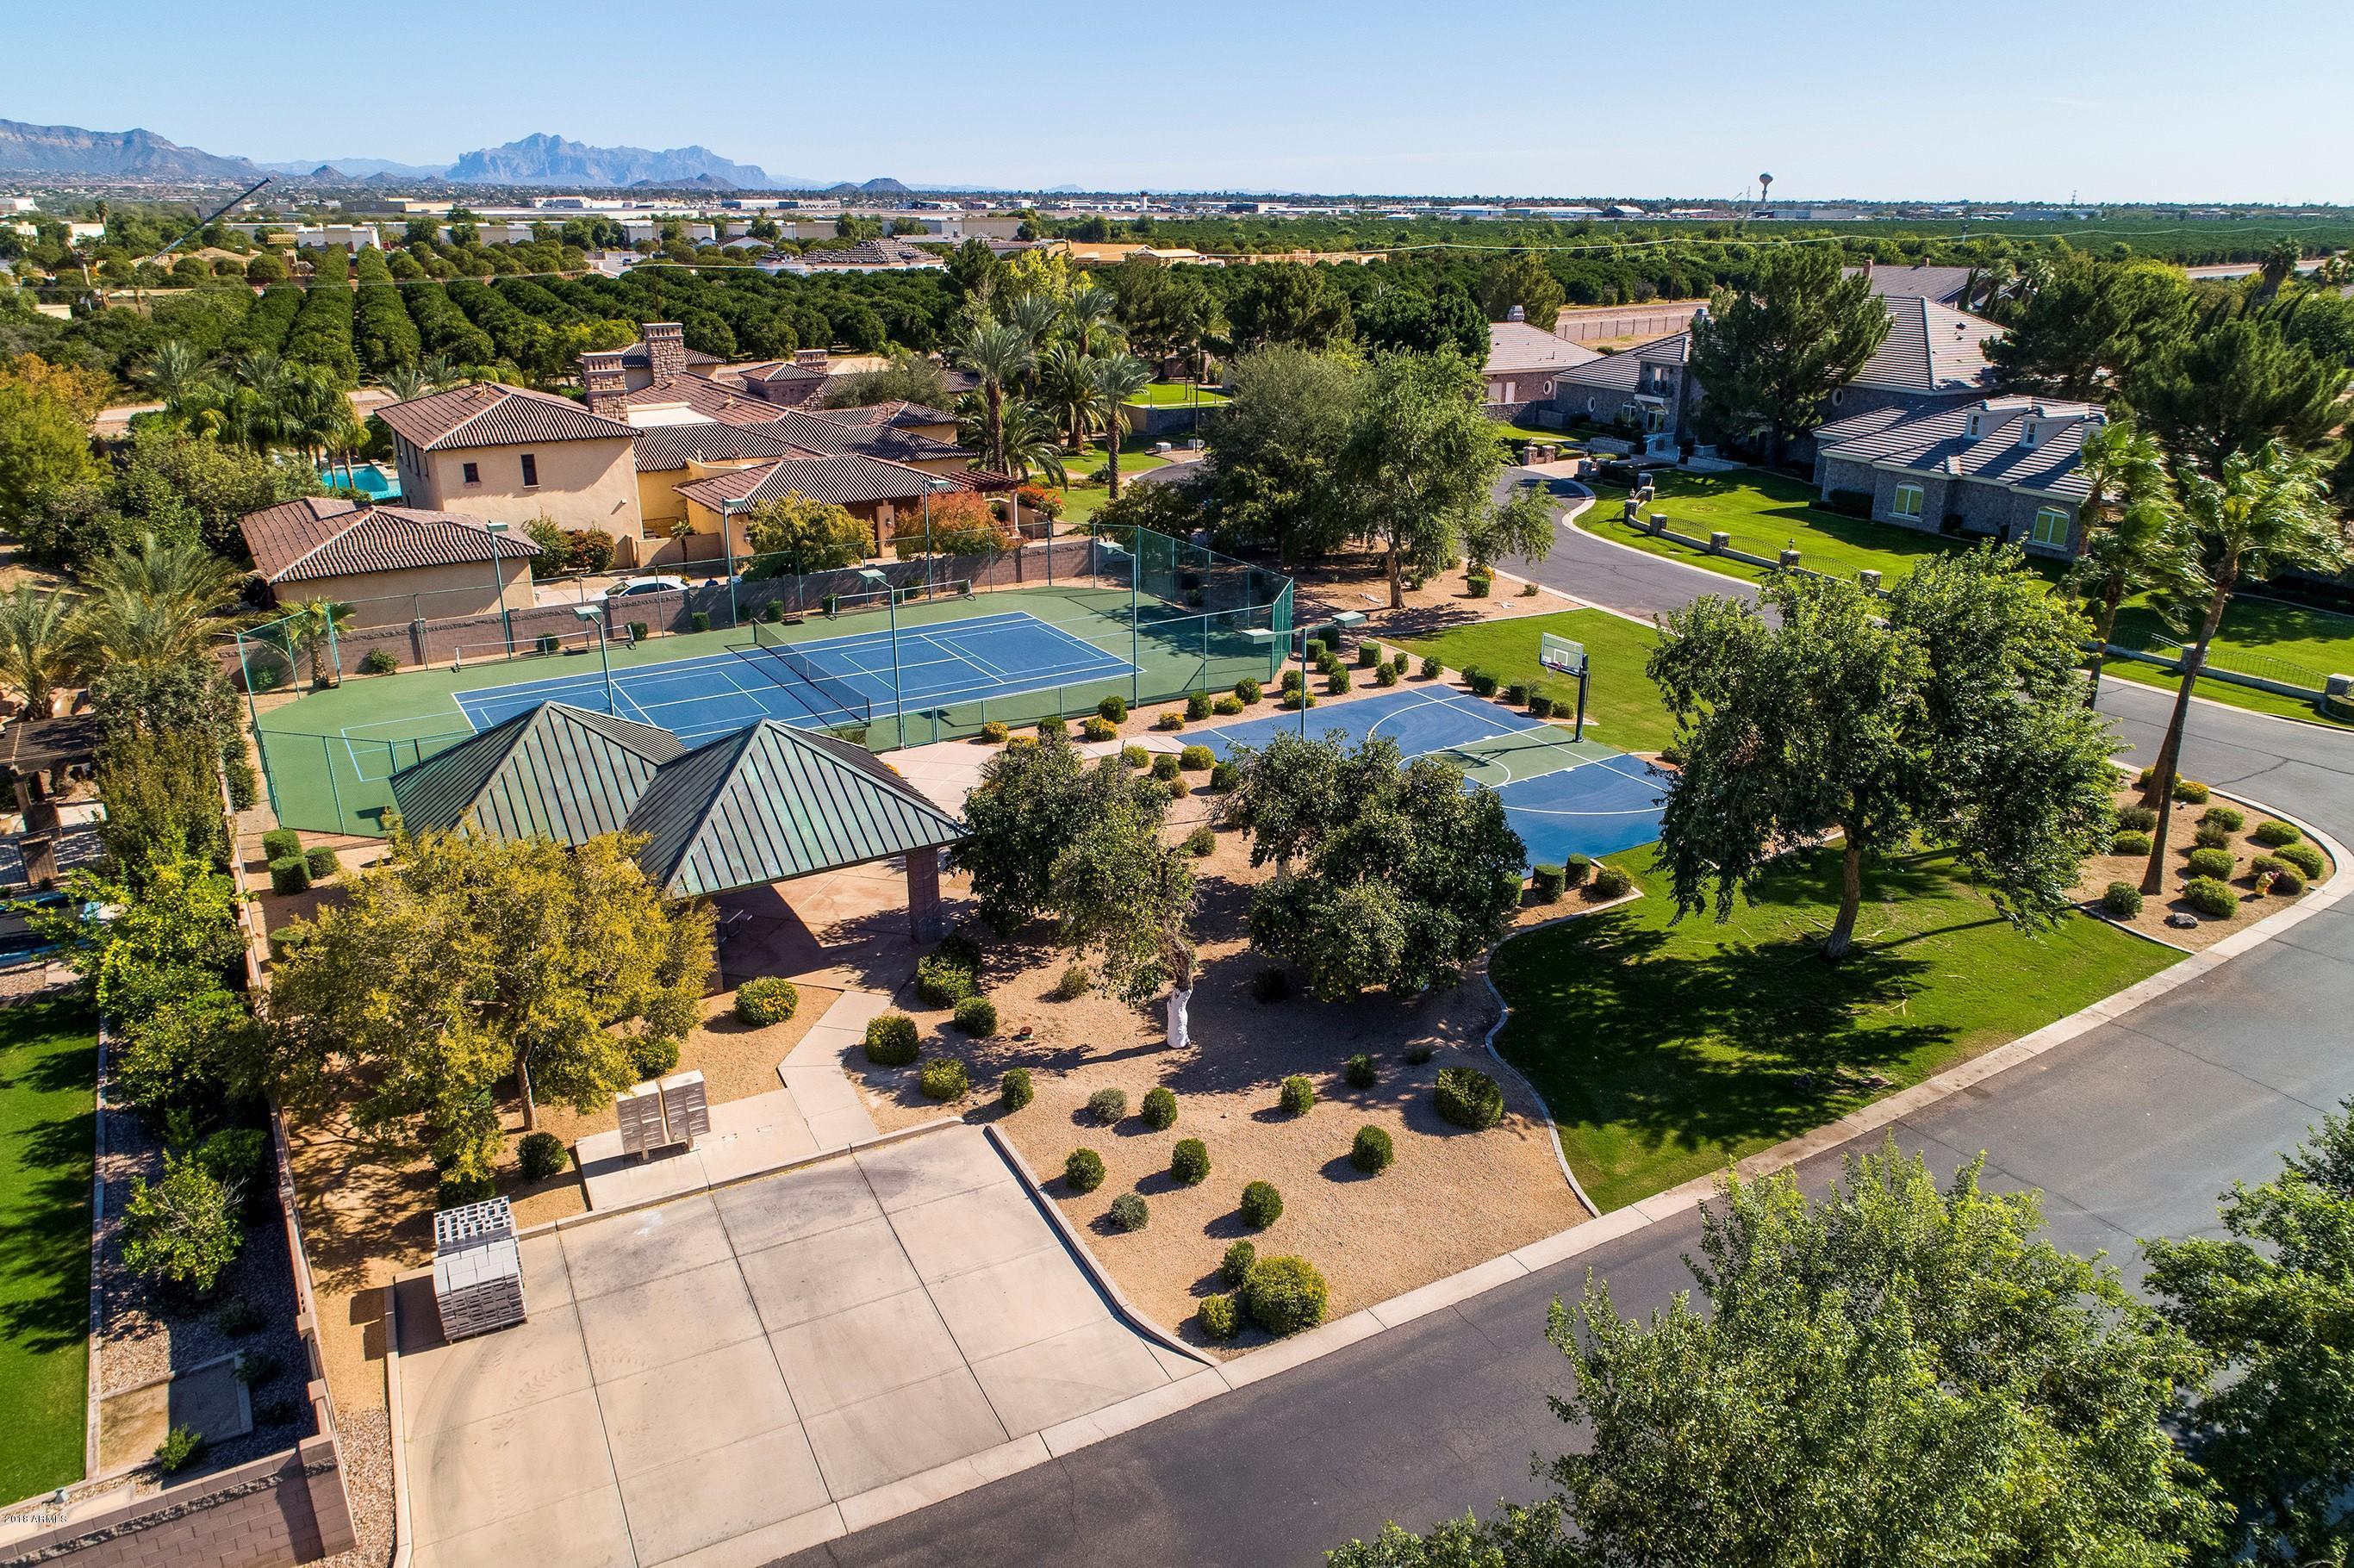 MLS 5850548 3925 E NORCROFT Circle, Mesa, AZ